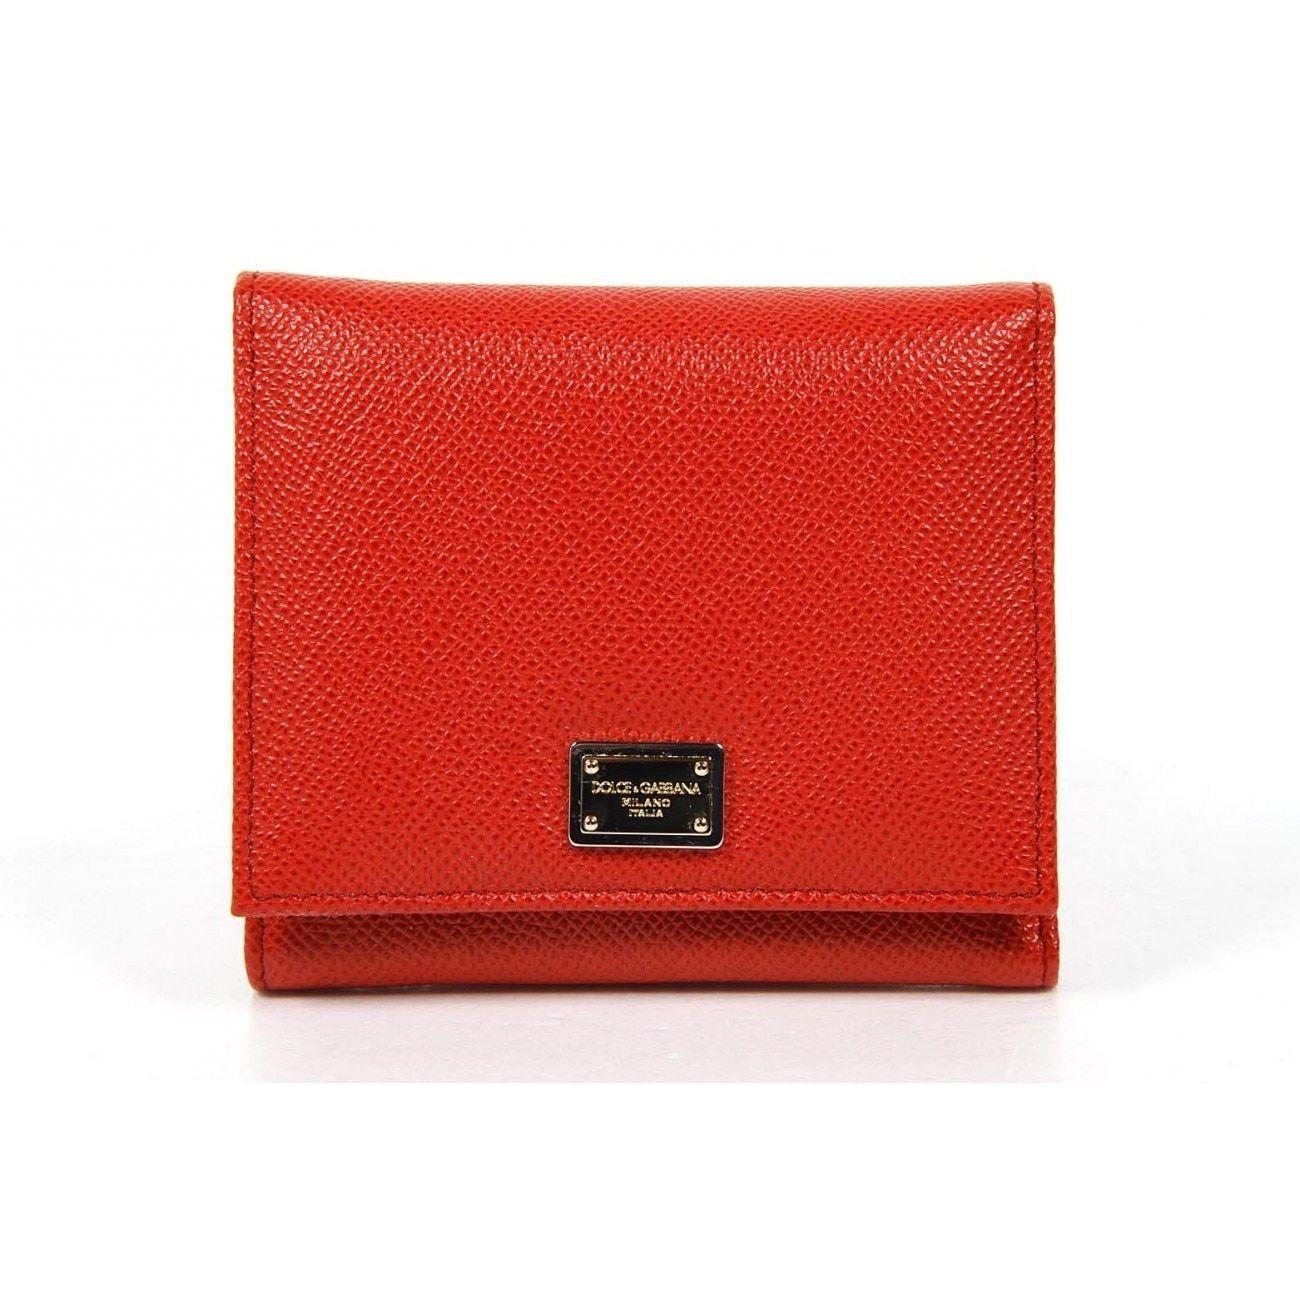 6c3ed881bf5f Dolce   Gabbana Blood Ladies  Wallet